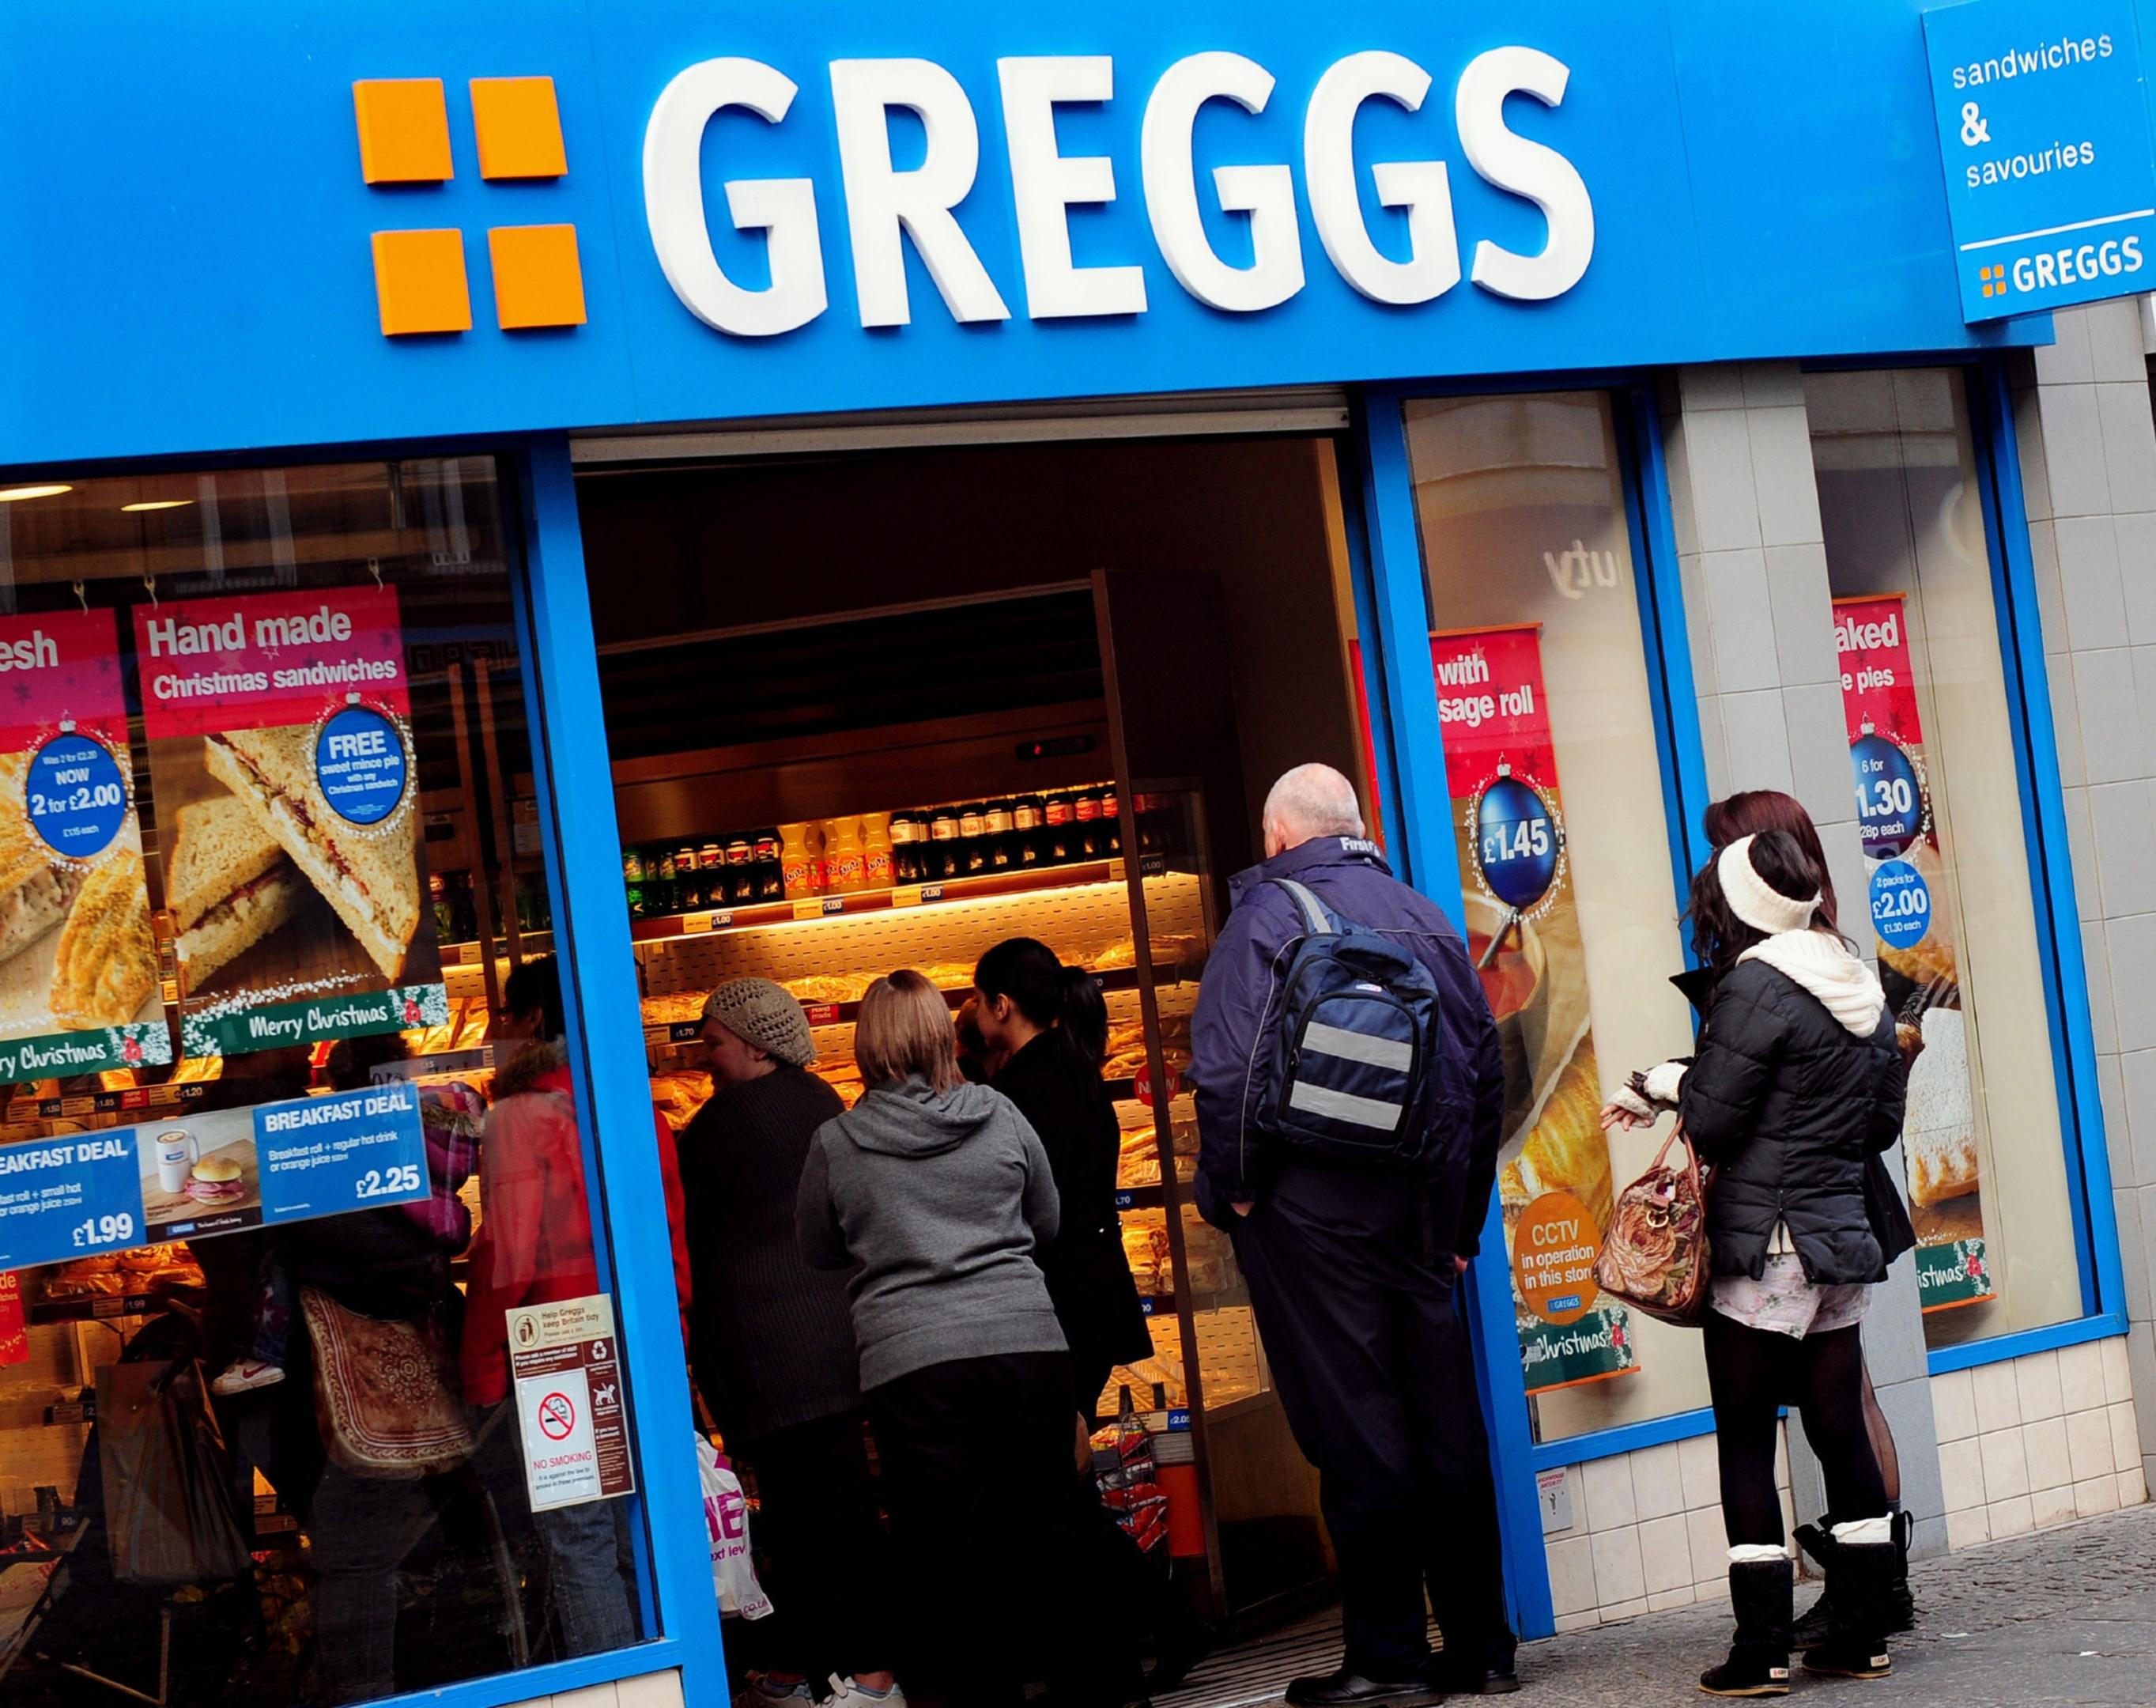 A Greggs branch.